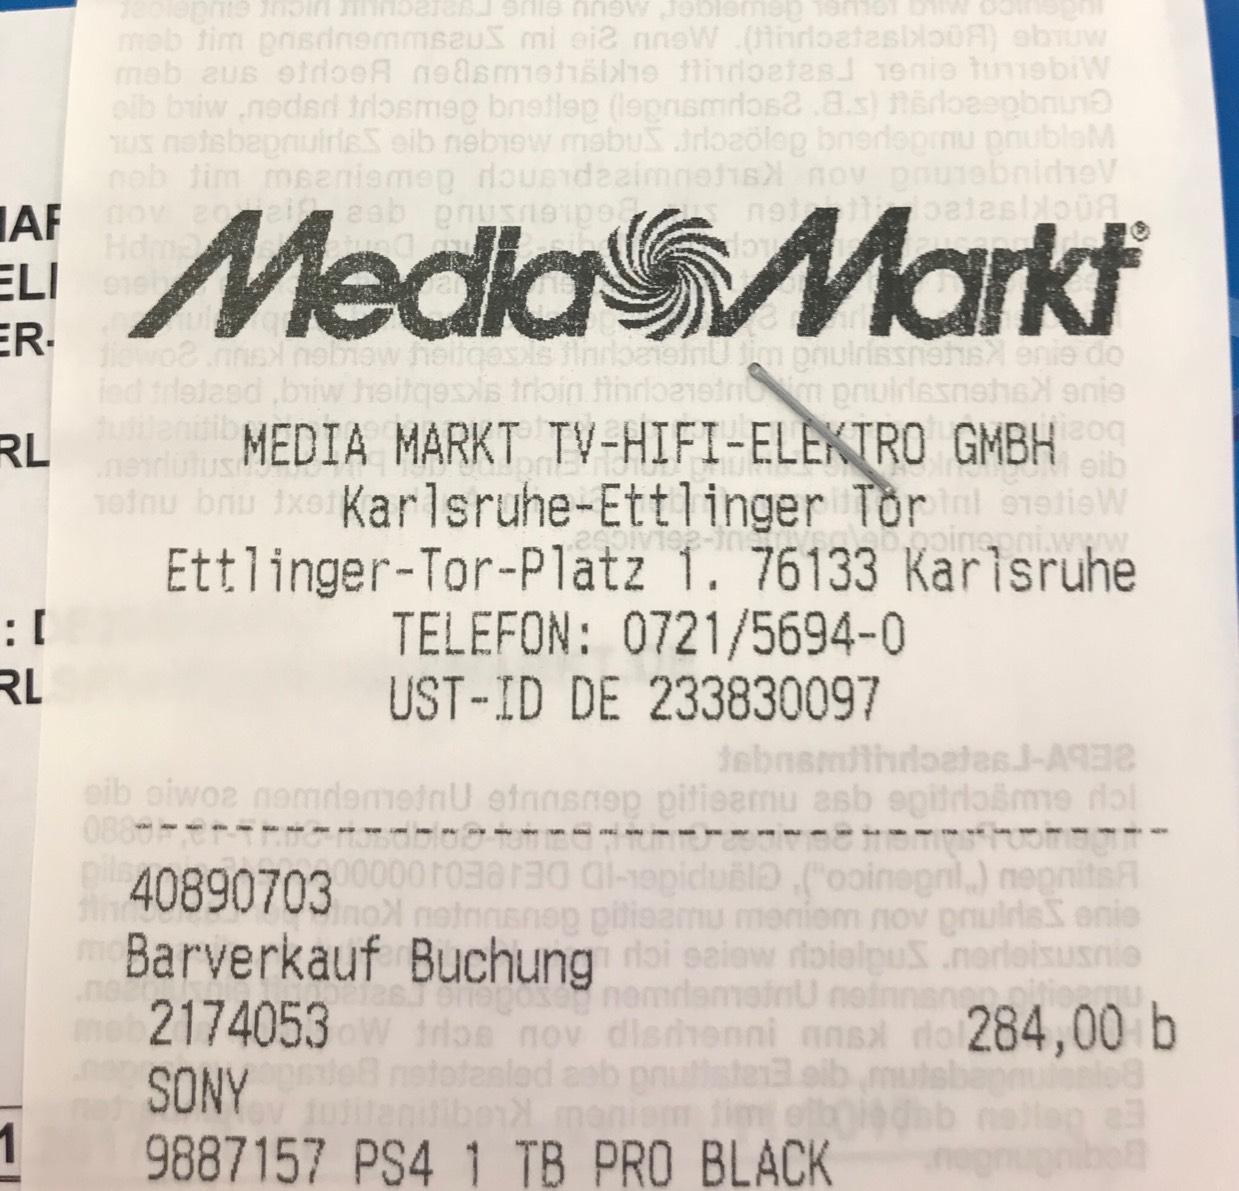 [PS4 PRO 1TB] Karlsruhe MediaMarkt